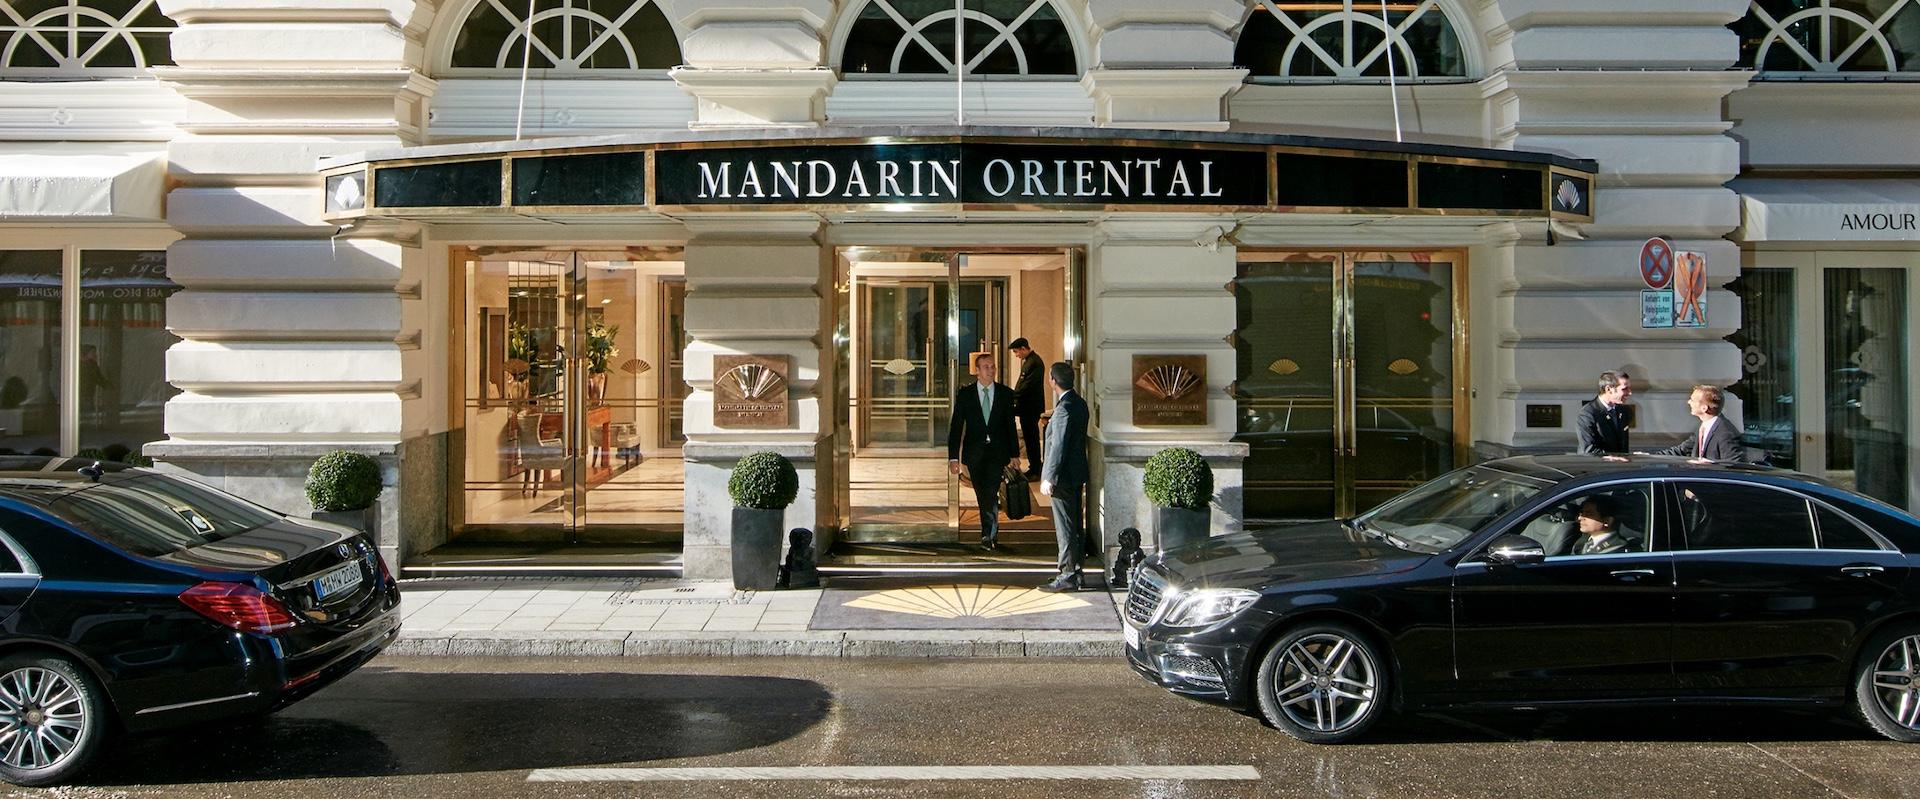 Mandarin Oriental Munich_Copyright